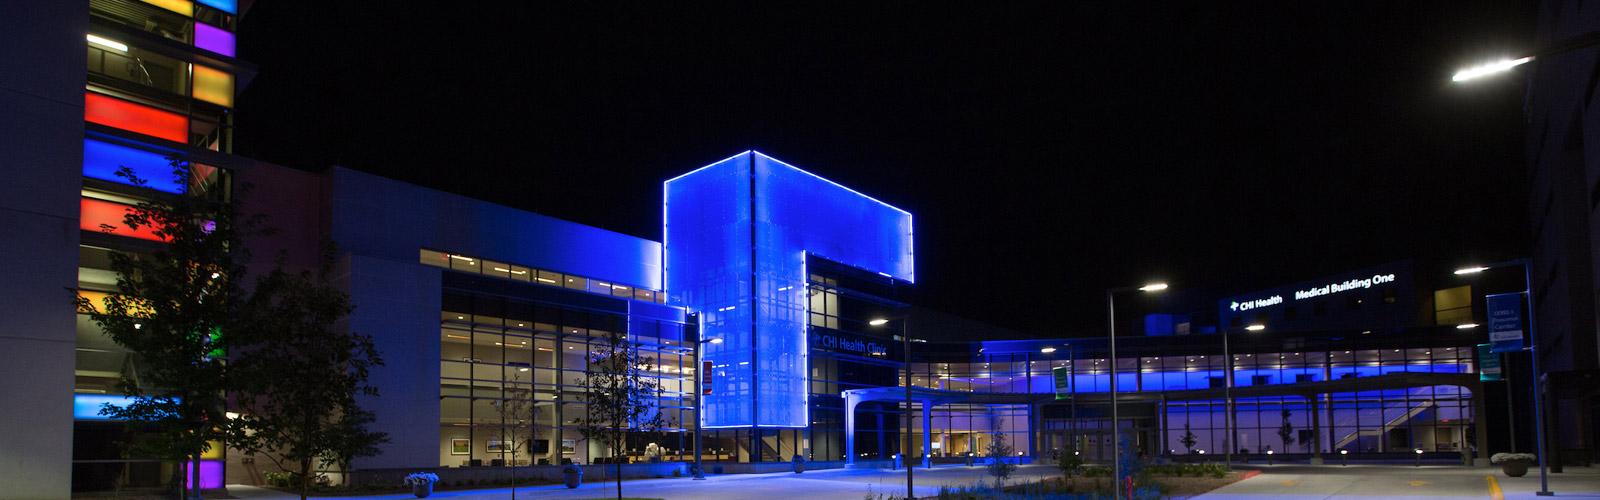 Creighton University Medical Center Bergan Mercy